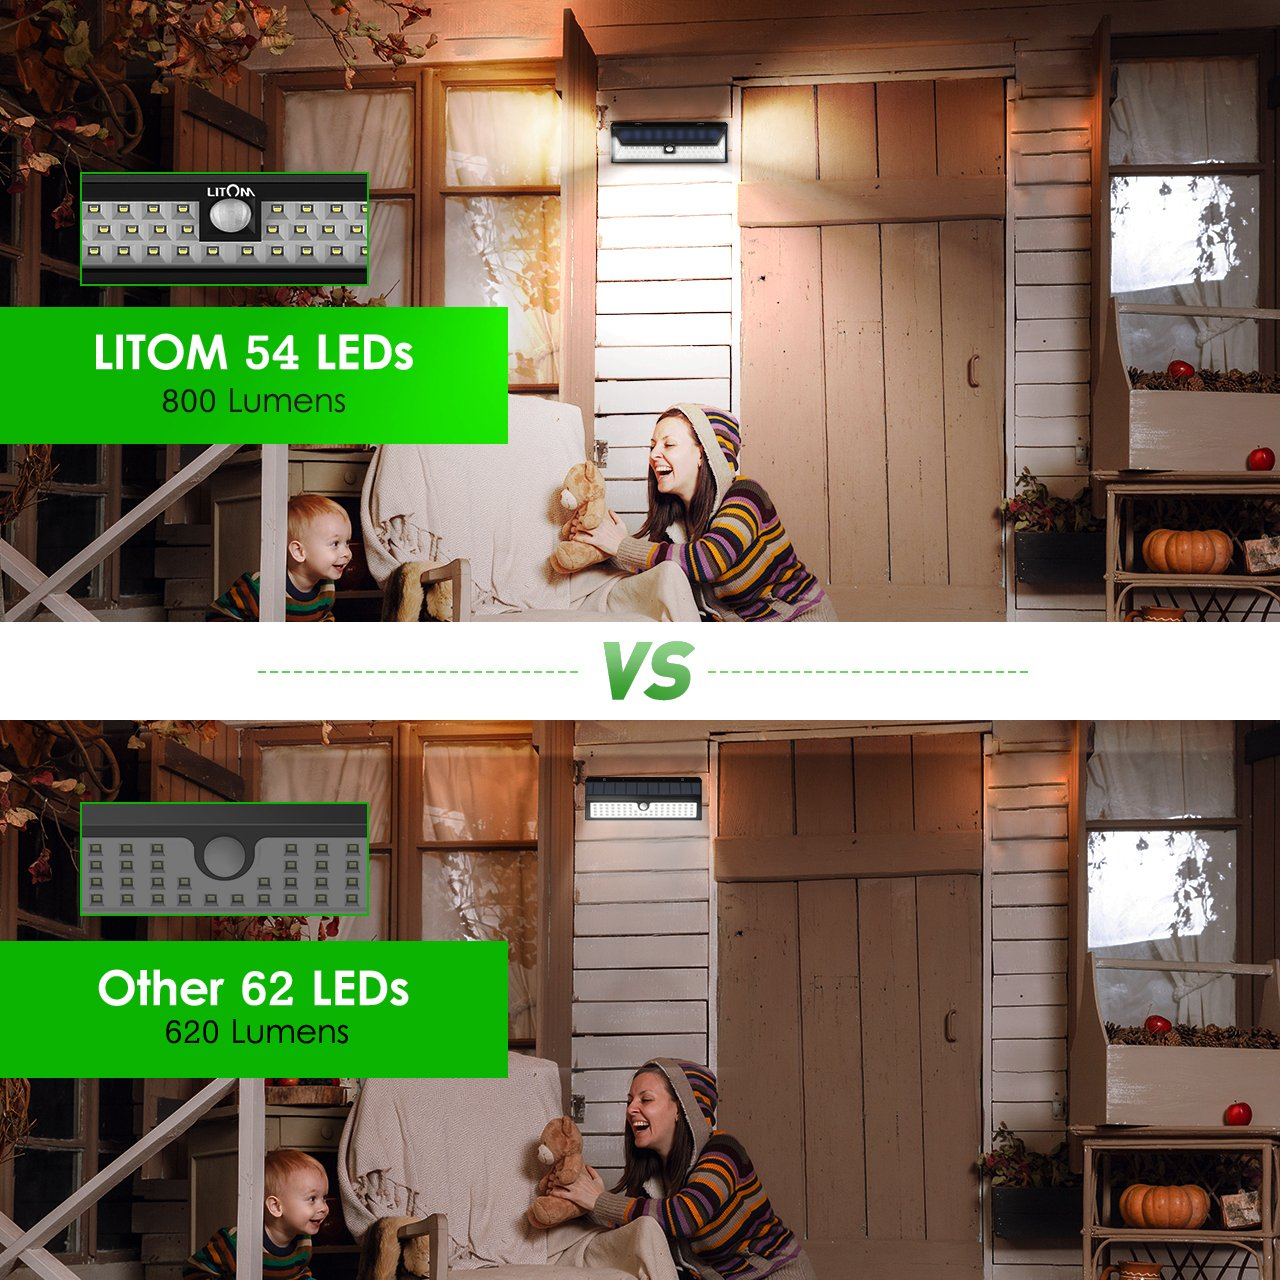 Litom Super Bright Solar Lights 54 LED Solar Power Outdoor Motion Sensor Light With LED on Both Side by Litom (Image #4)